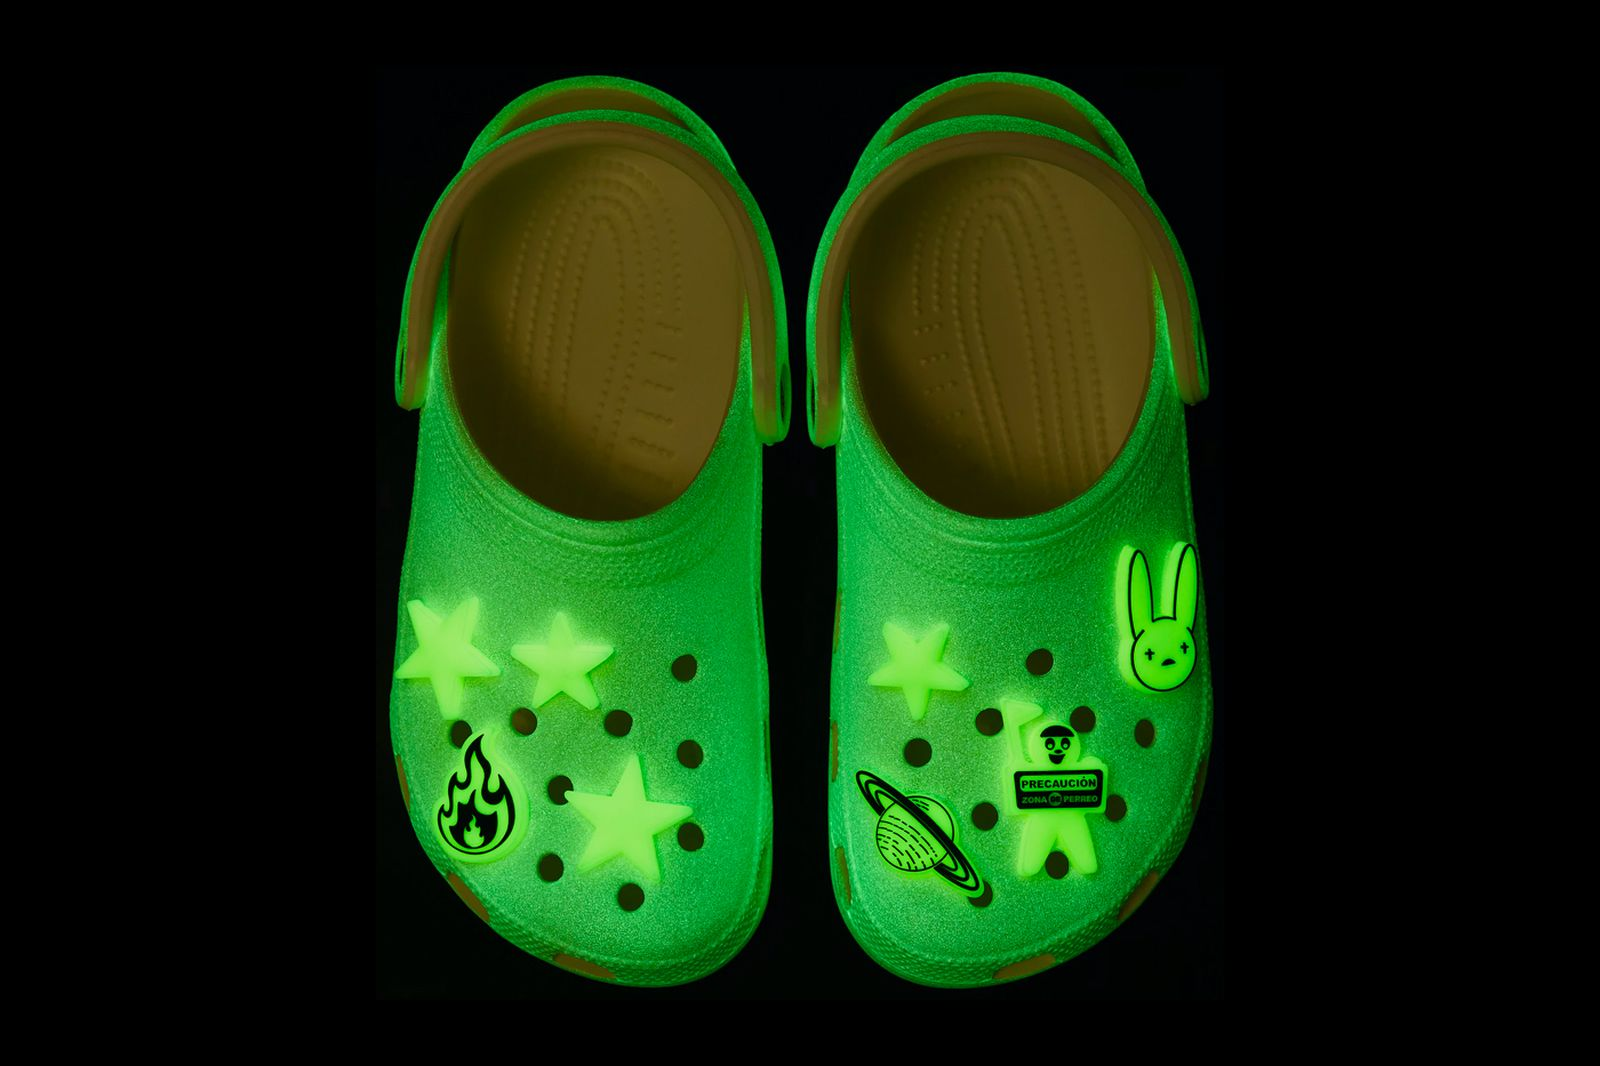 bad-bunny-crocs-glow-in-the-dark-clog-info-04